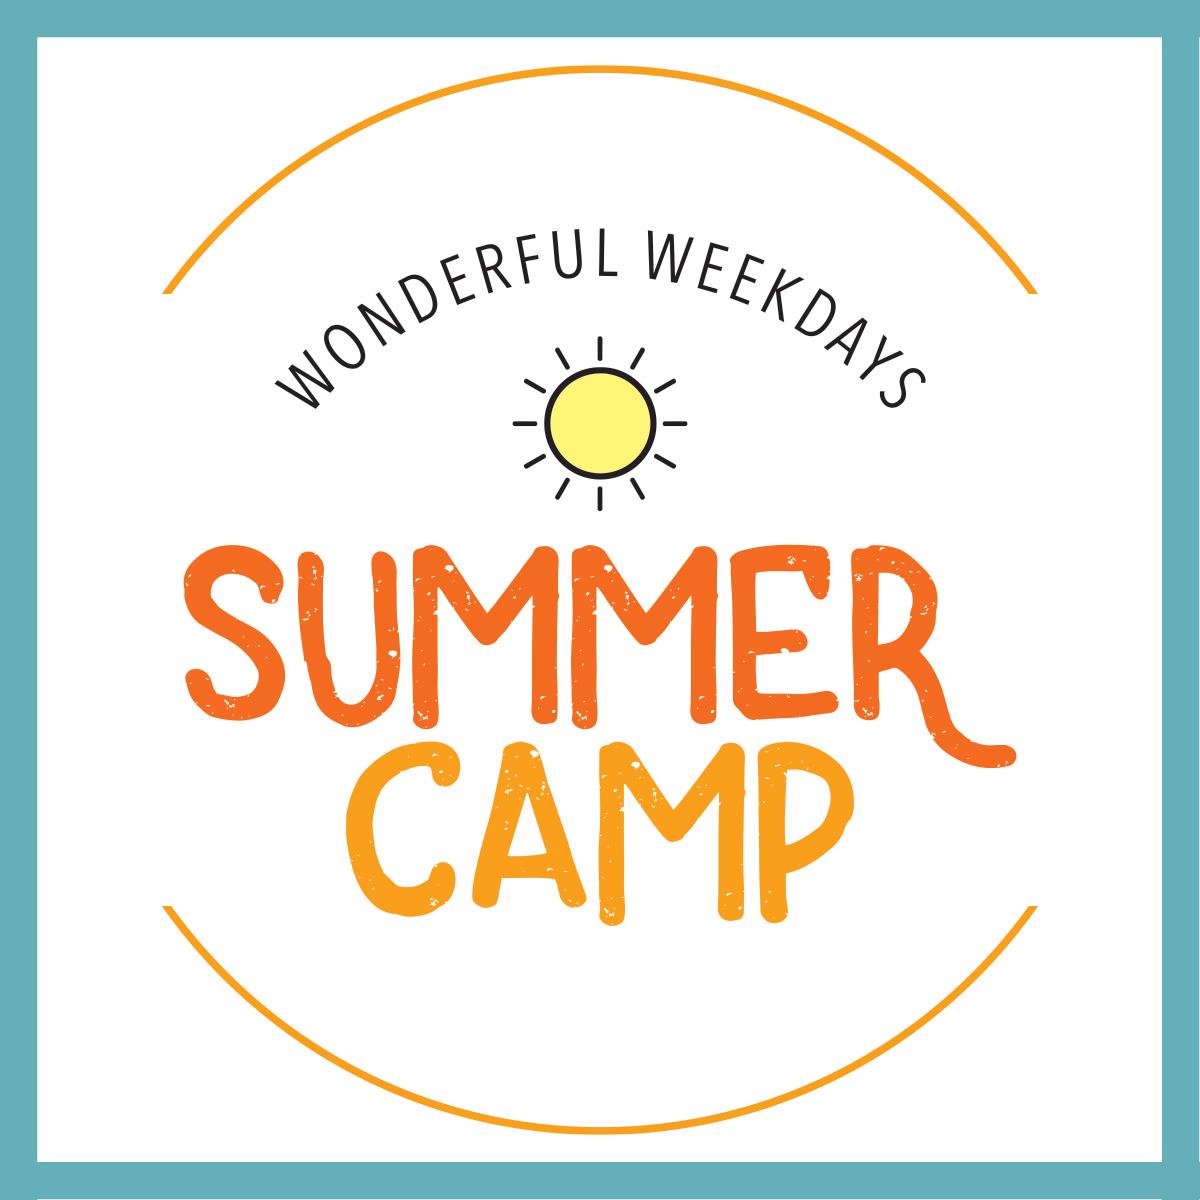 ww-summercamp.jpg